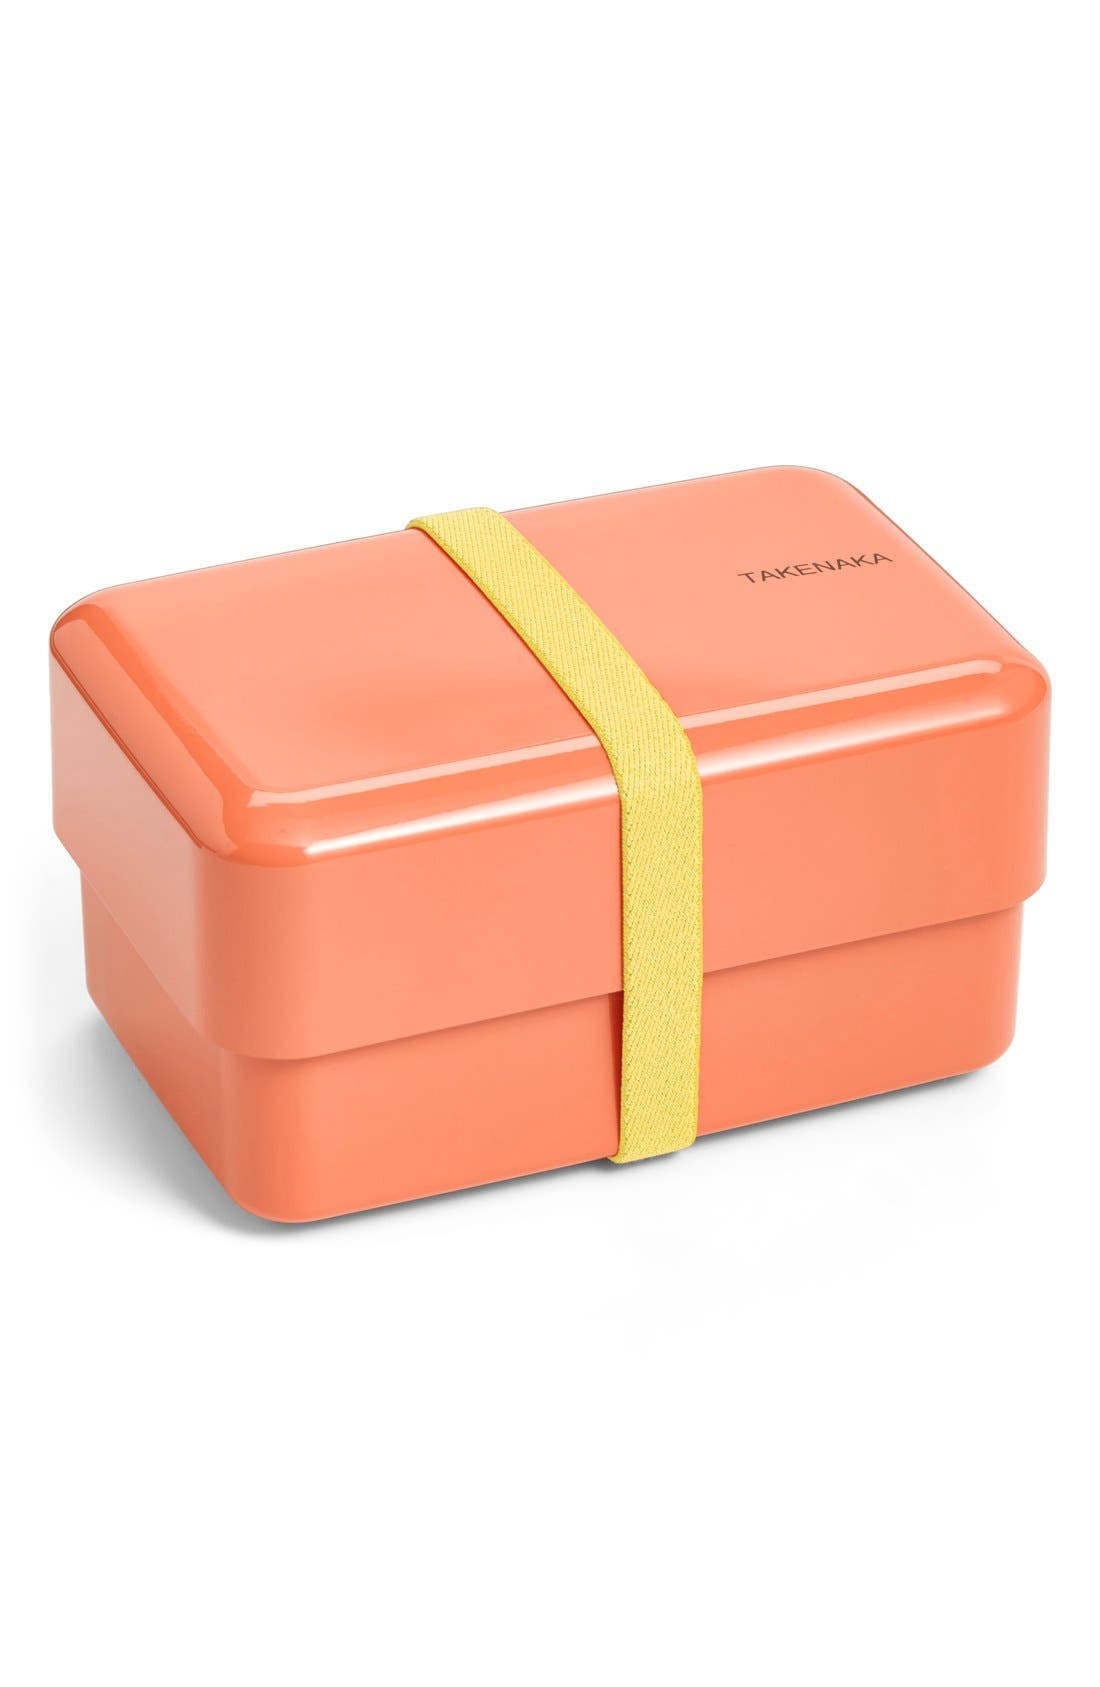 Alternate Image 1 Selected - Takenaka Bento Box 'Rectangle' Bento Box